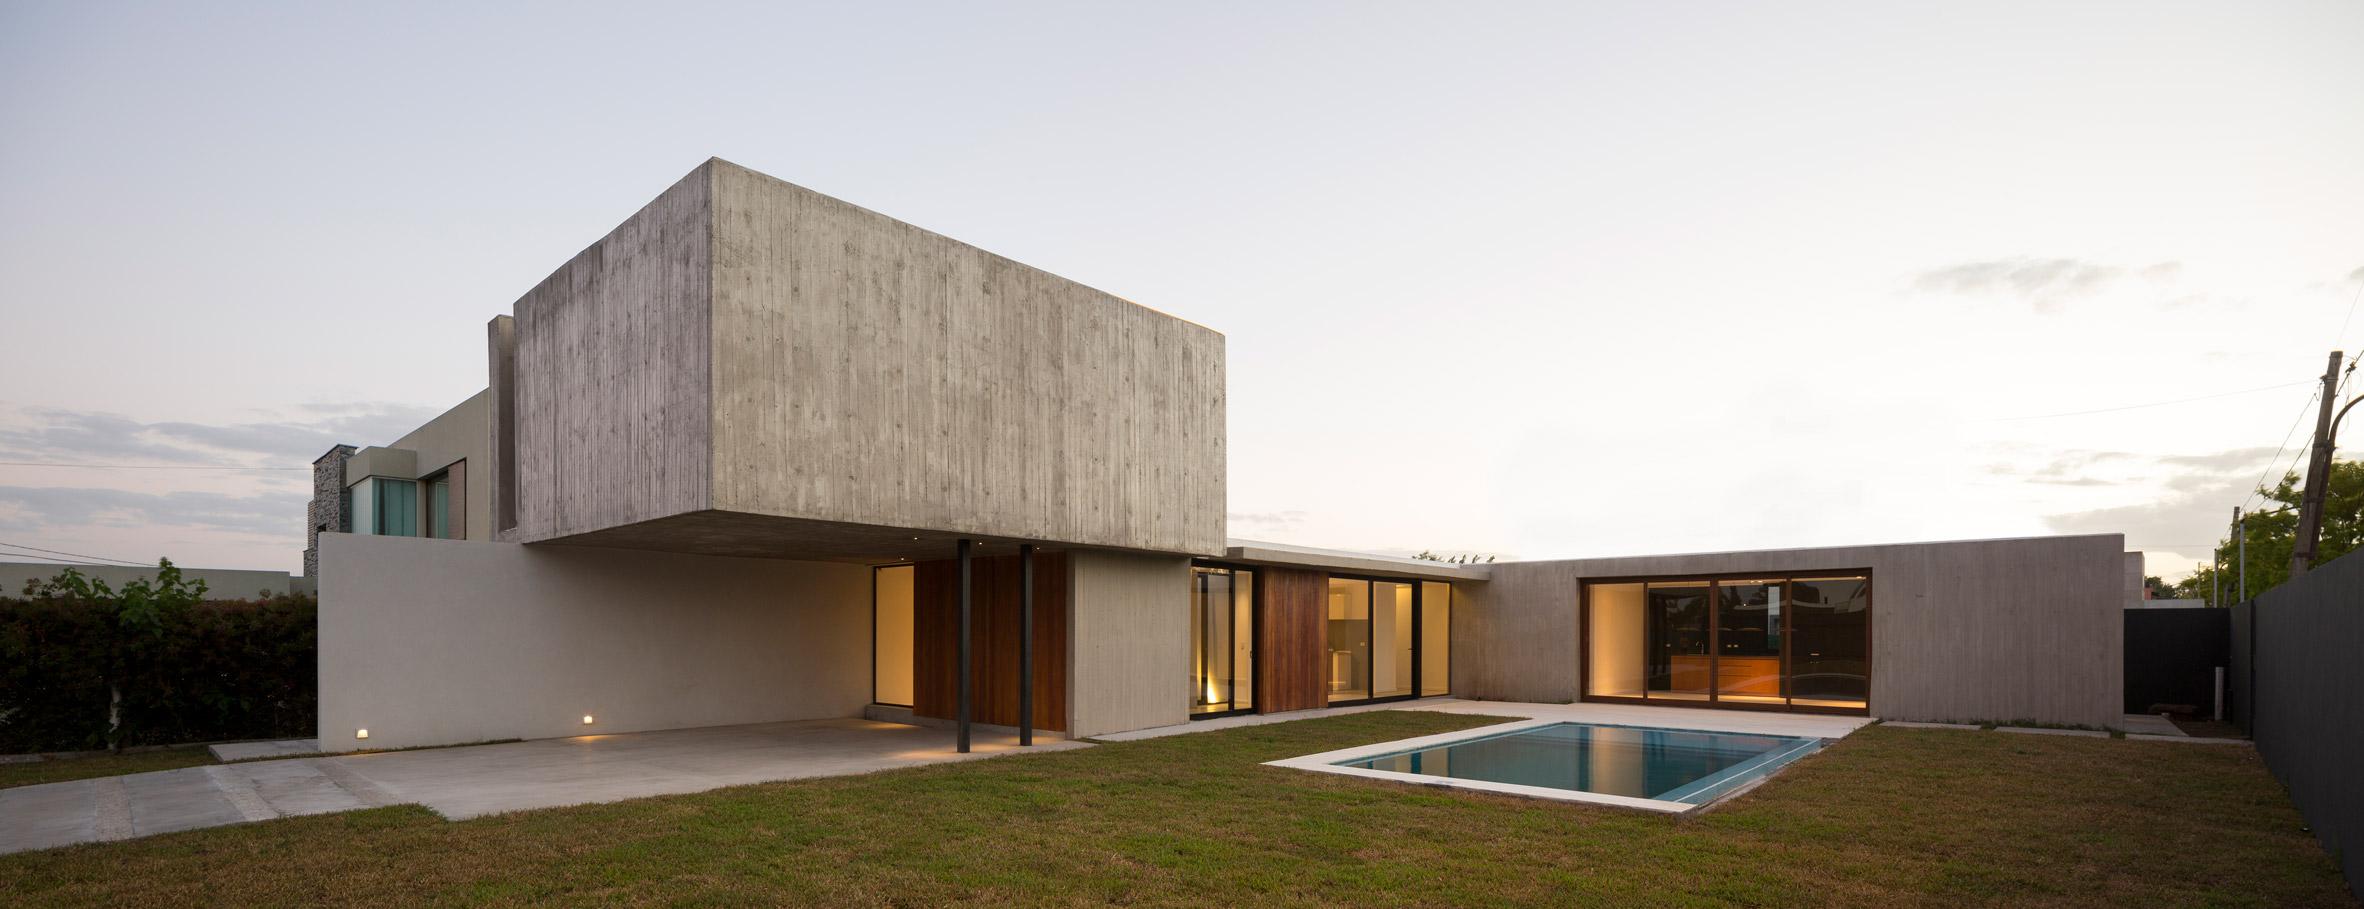 Rex House by Felipe Gonzalez Arzac